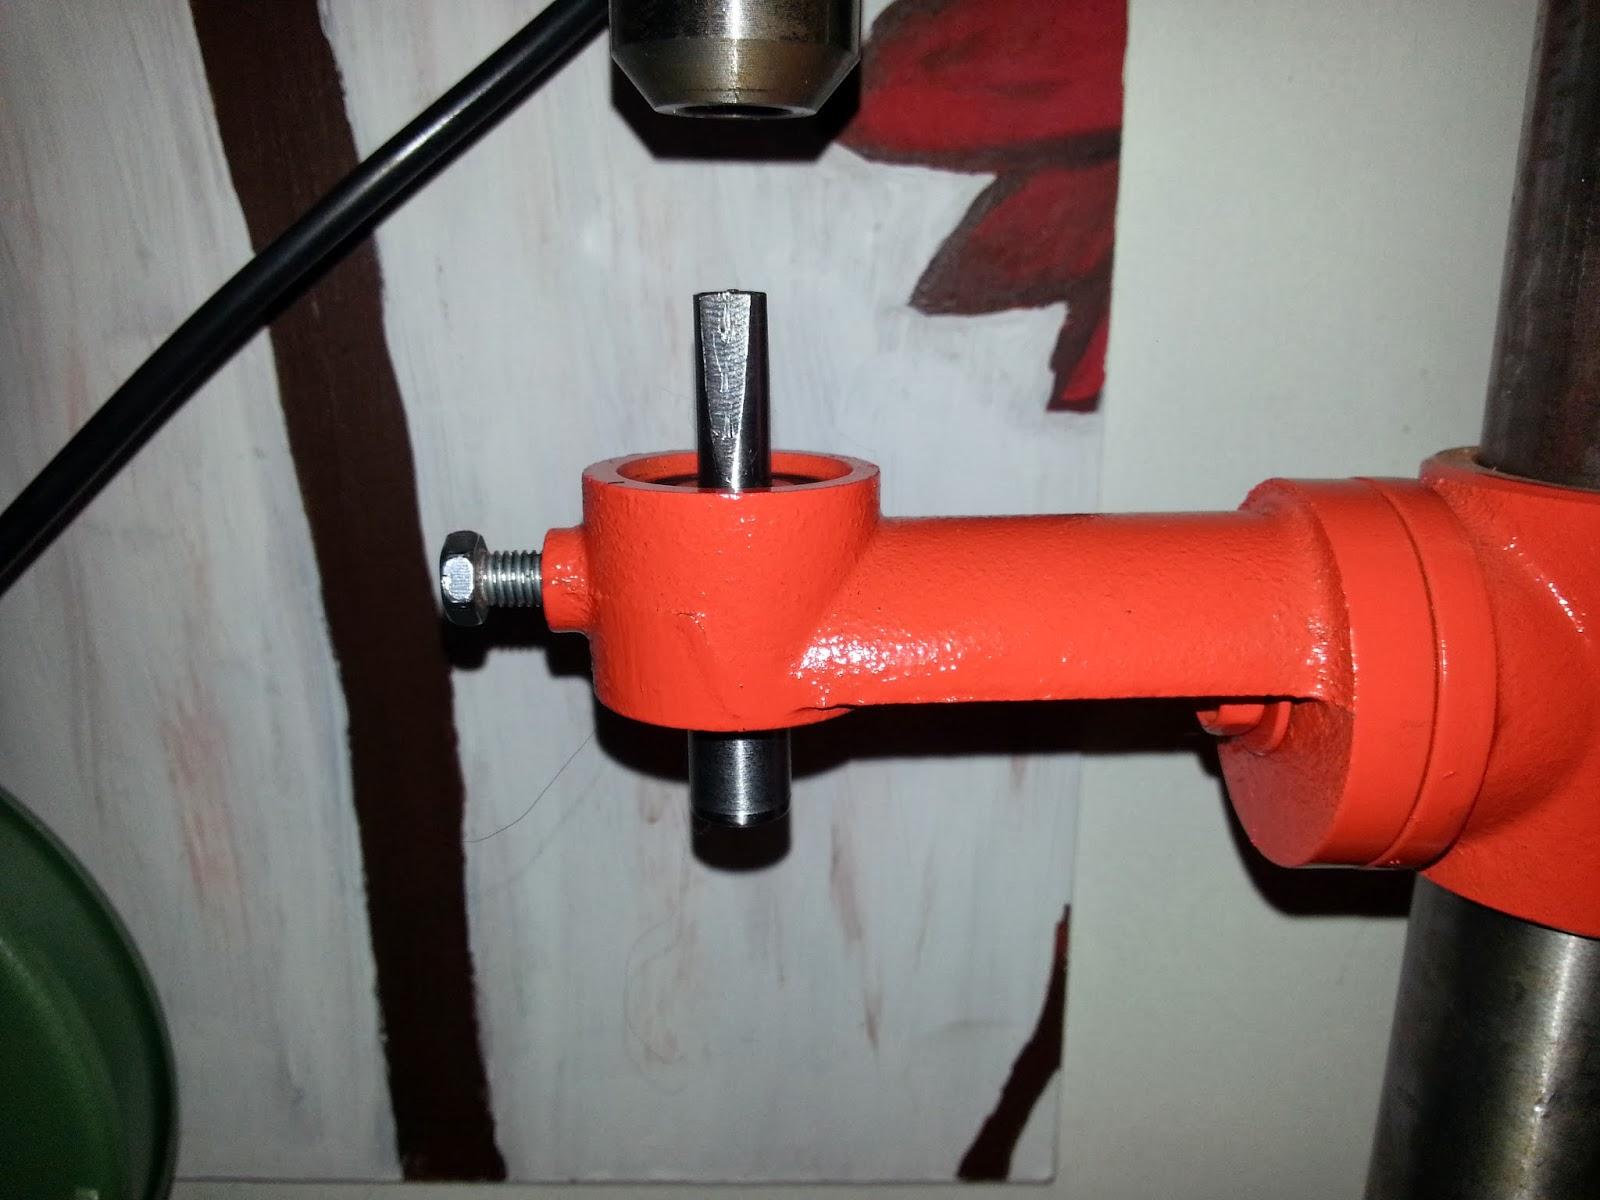 Pillar drill milling arm/ Brazo de fresado de taladro de banco